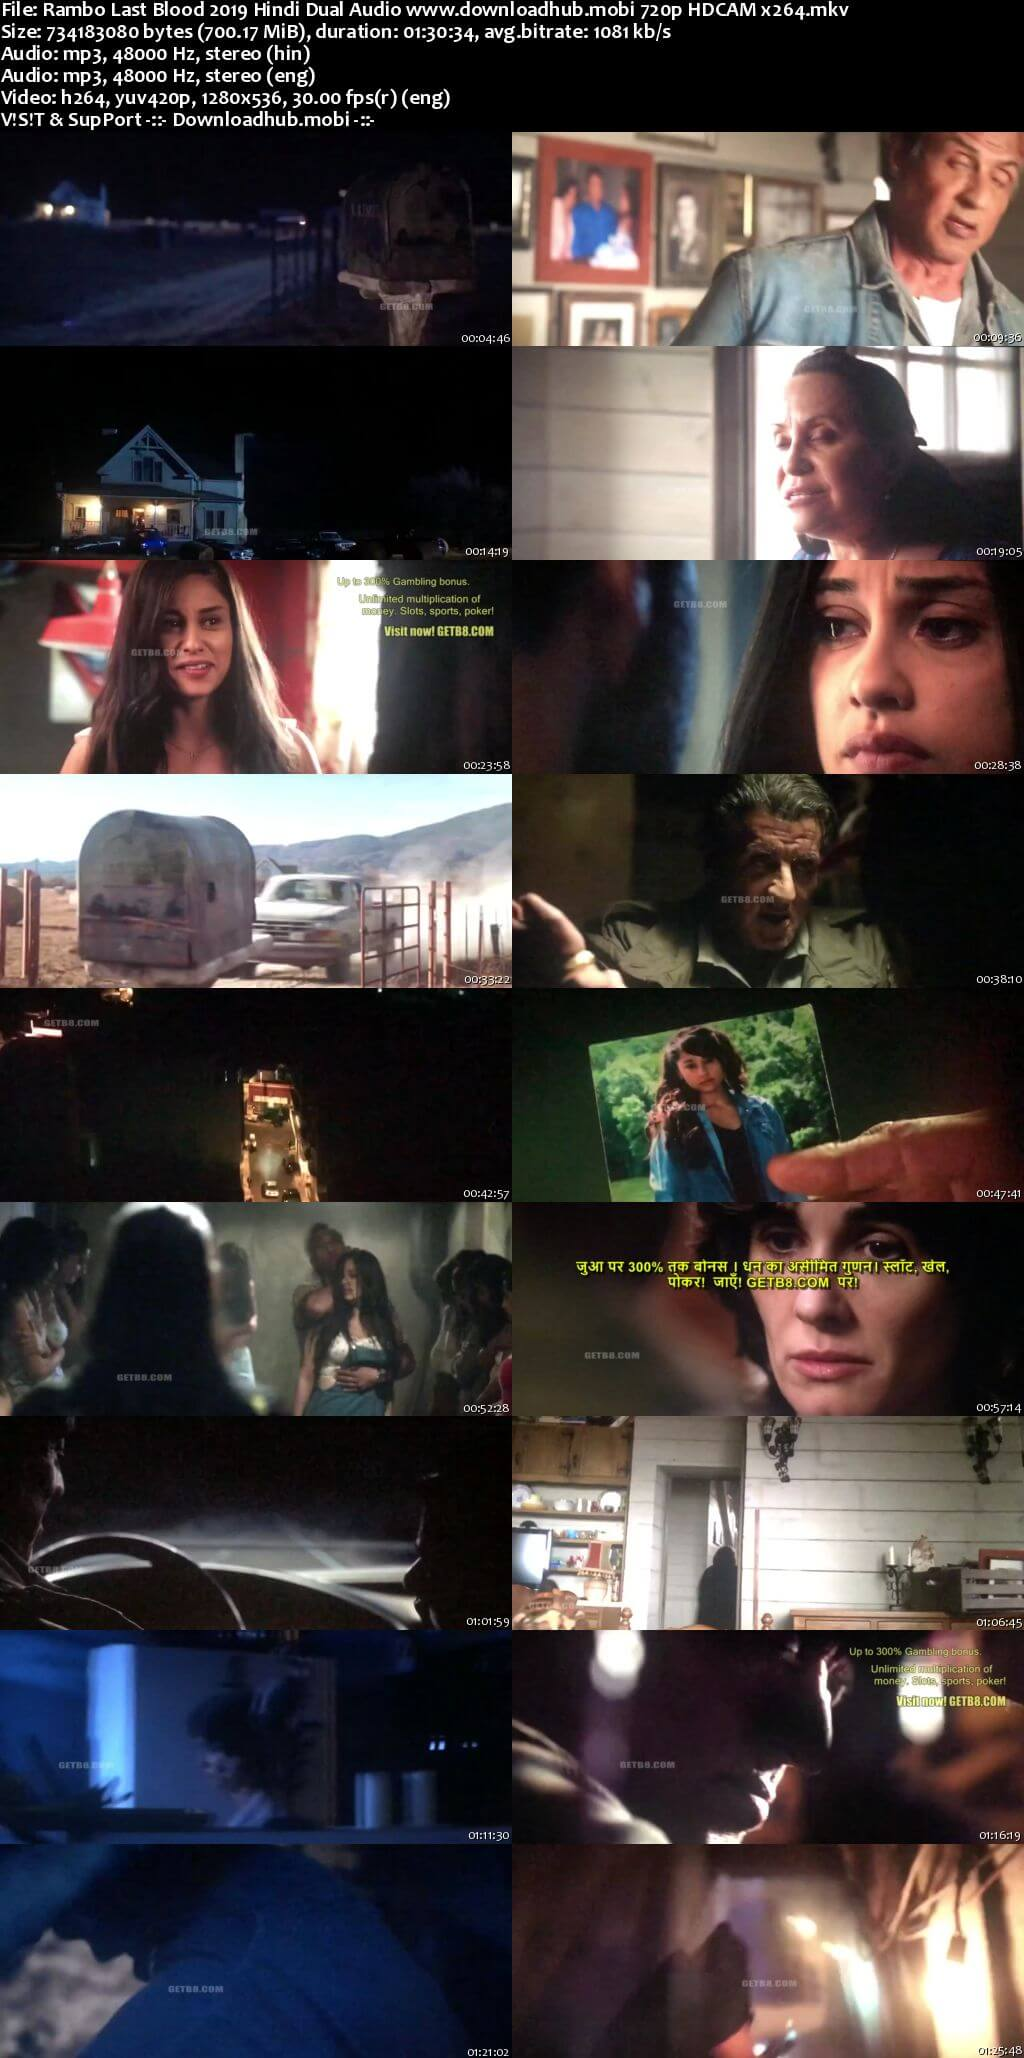 Rambo Last Blood 2019 Hindi Dual Audio 720p HDCAM x264